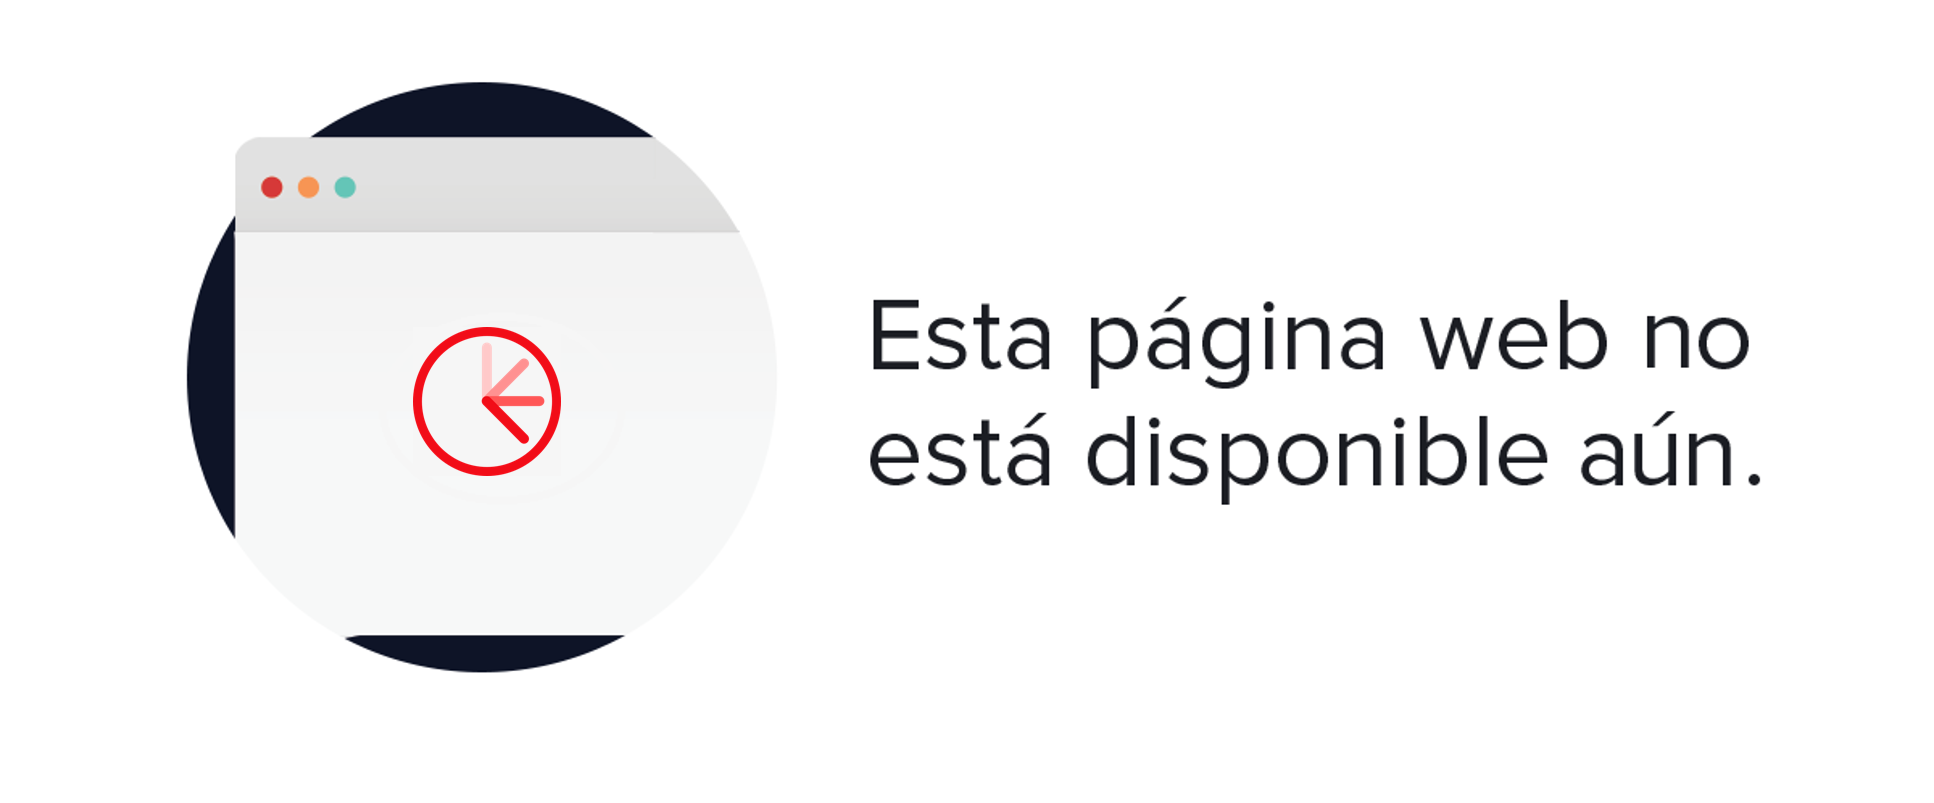 Descuento : Meline - ALBA Blanco / Negro 7319069 CUJGDFQ